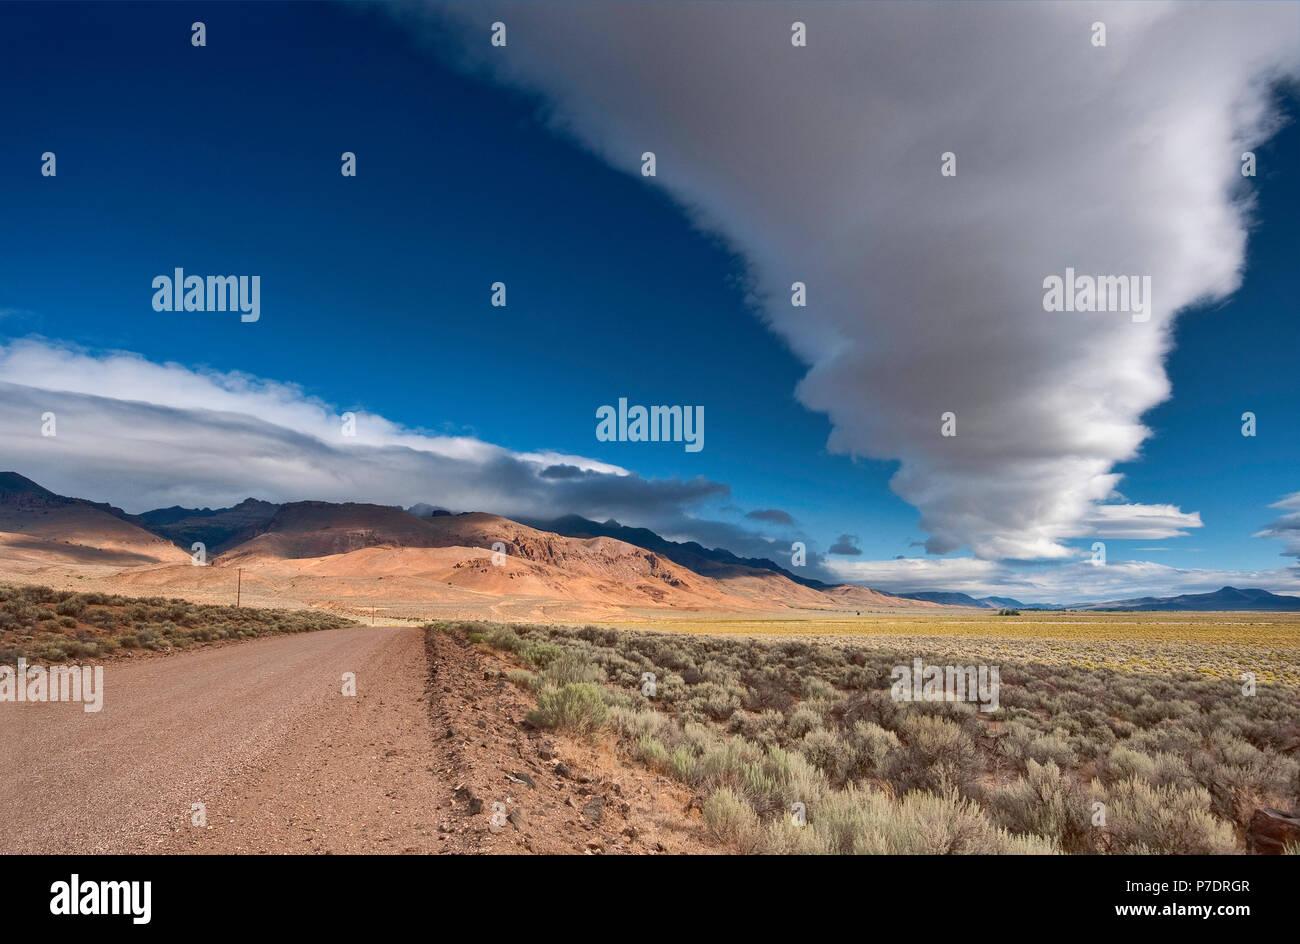 Gigante nube cumulus sobre Timor Steen Road cerca Steens Mountain, Alvord Desierto, parte del Great Basin Desert, Oregón, EE.UU. Imagen De Stock